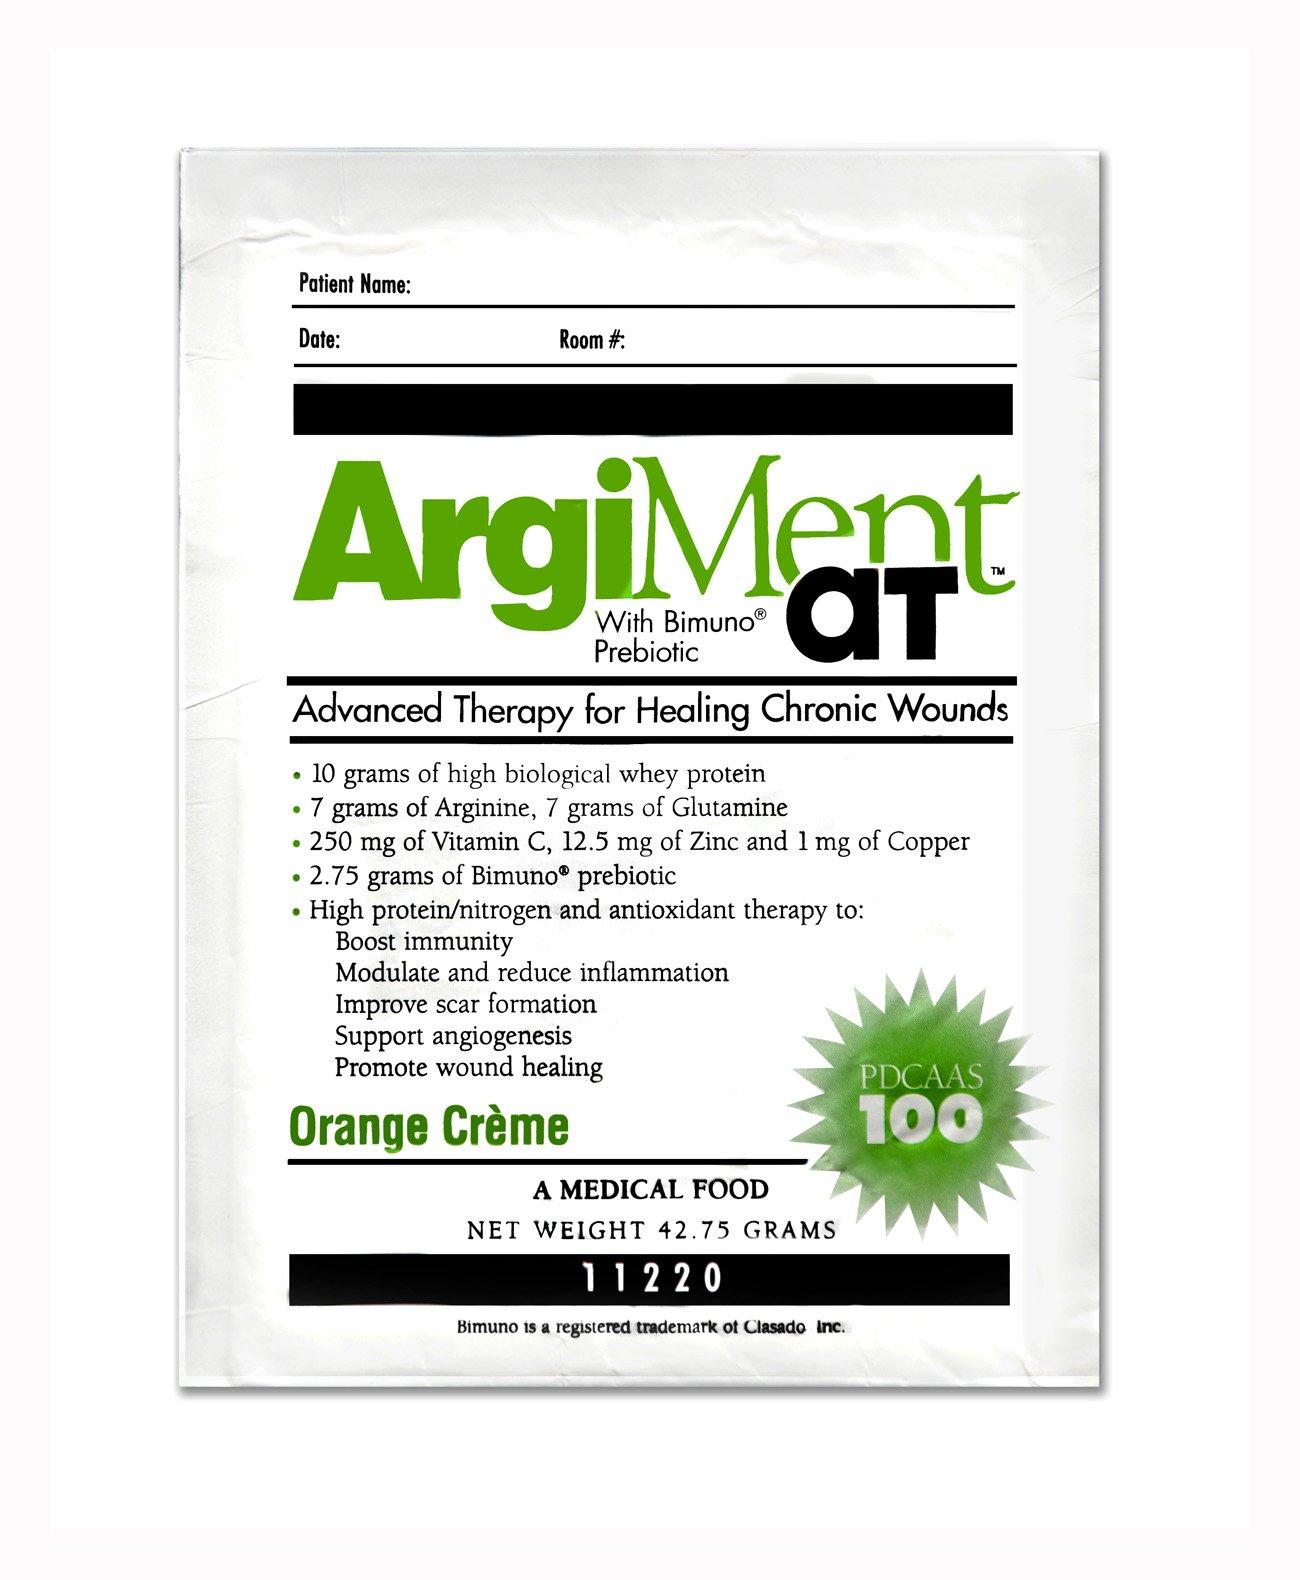 National Nutrition Inc Argiment Nutritional Supplement, Nni11220, 1 Pound